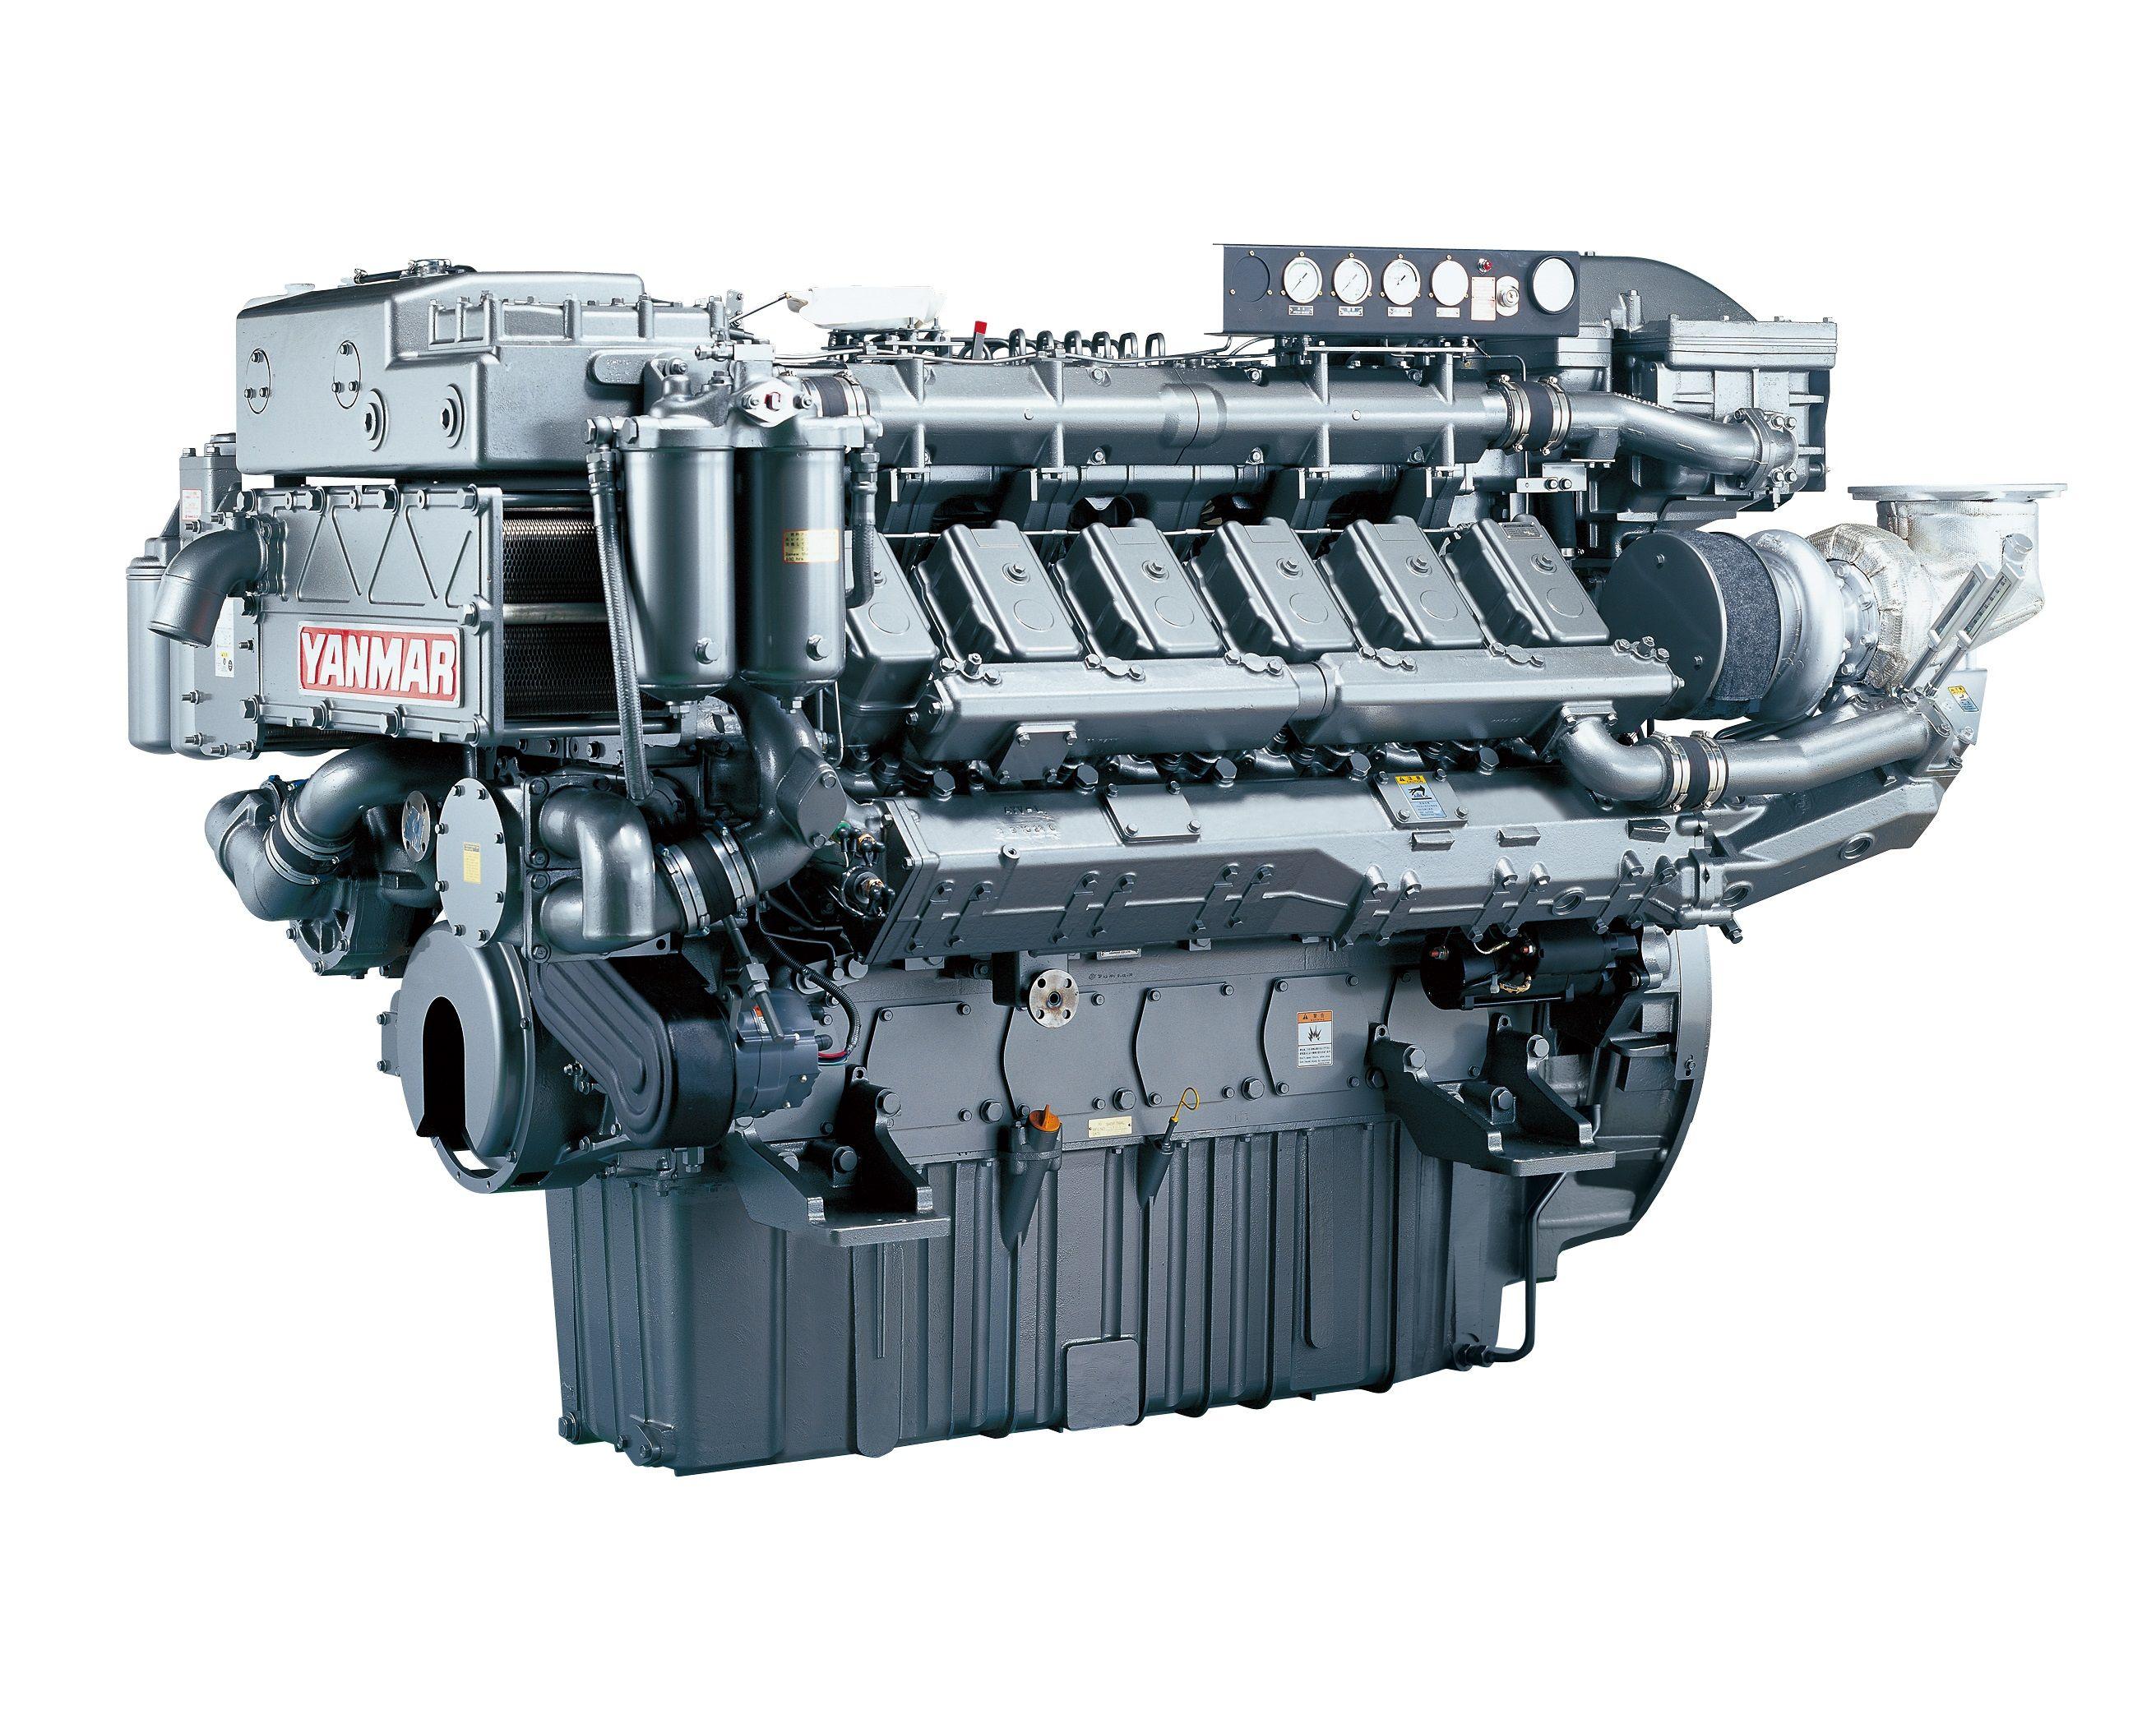 c6c54b65cec29496e4957141142bd664 jpg 2622 2091 motor pinterest rh pinterest com Daihatsu Diesel America Inc Daihatsu 950D Engine